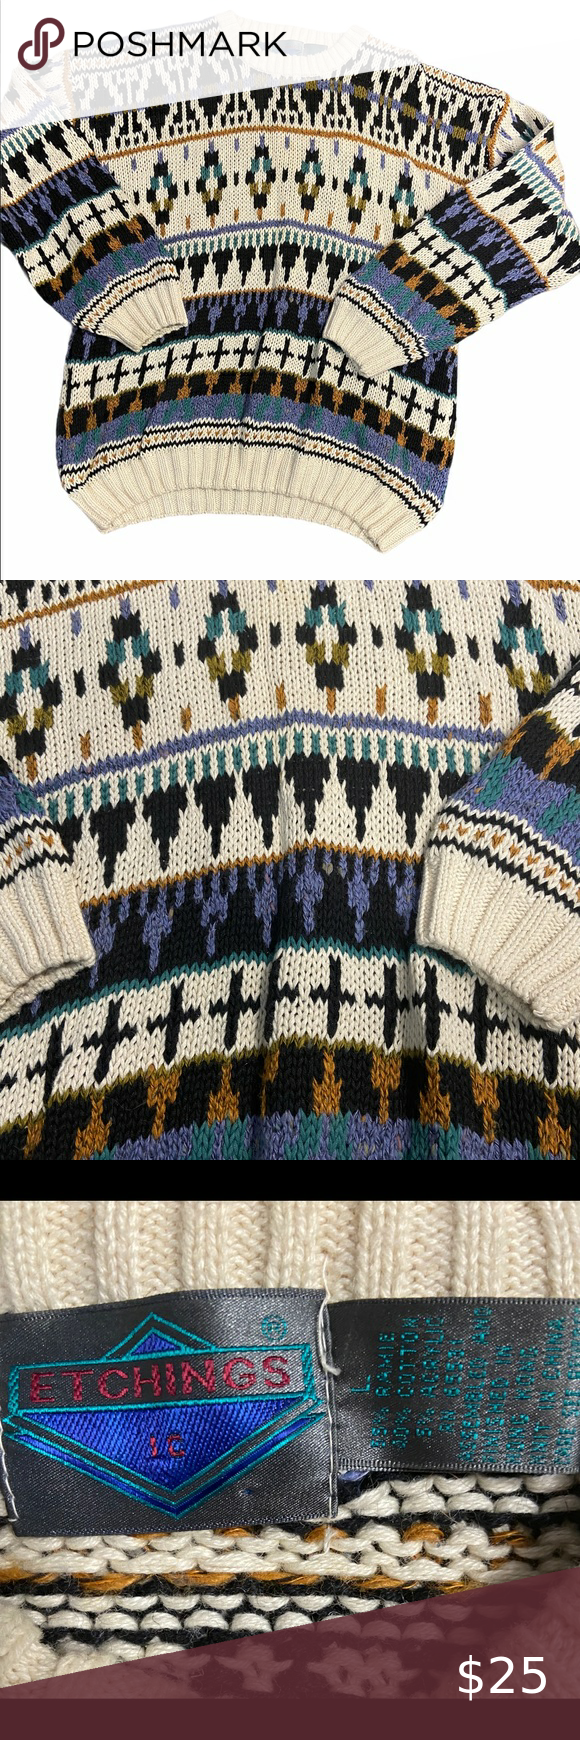 80s/90s Vtg Oversized Colorful Grandpa Sweater